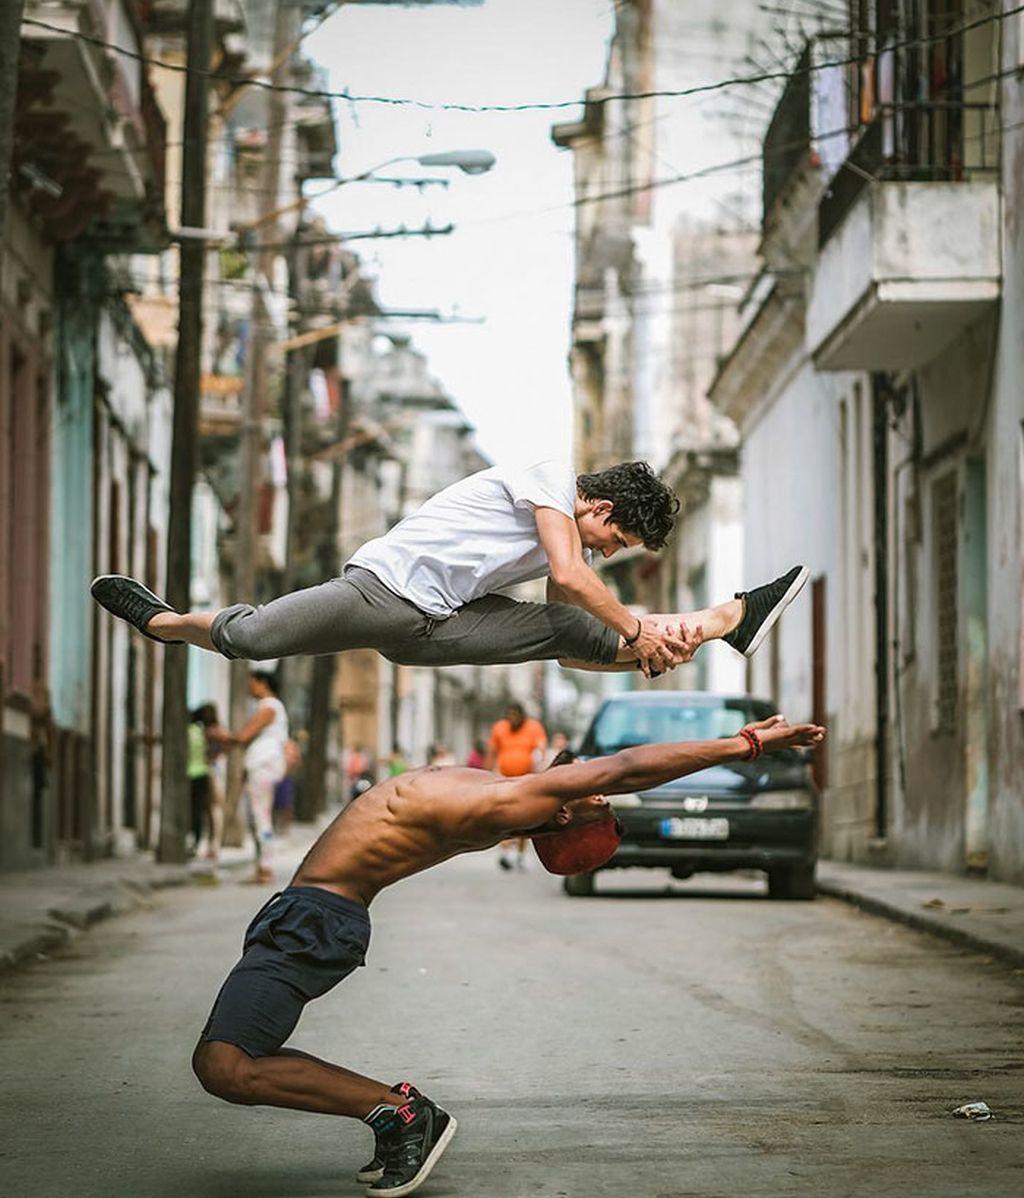 Consiguió ir a La Habana con una beca